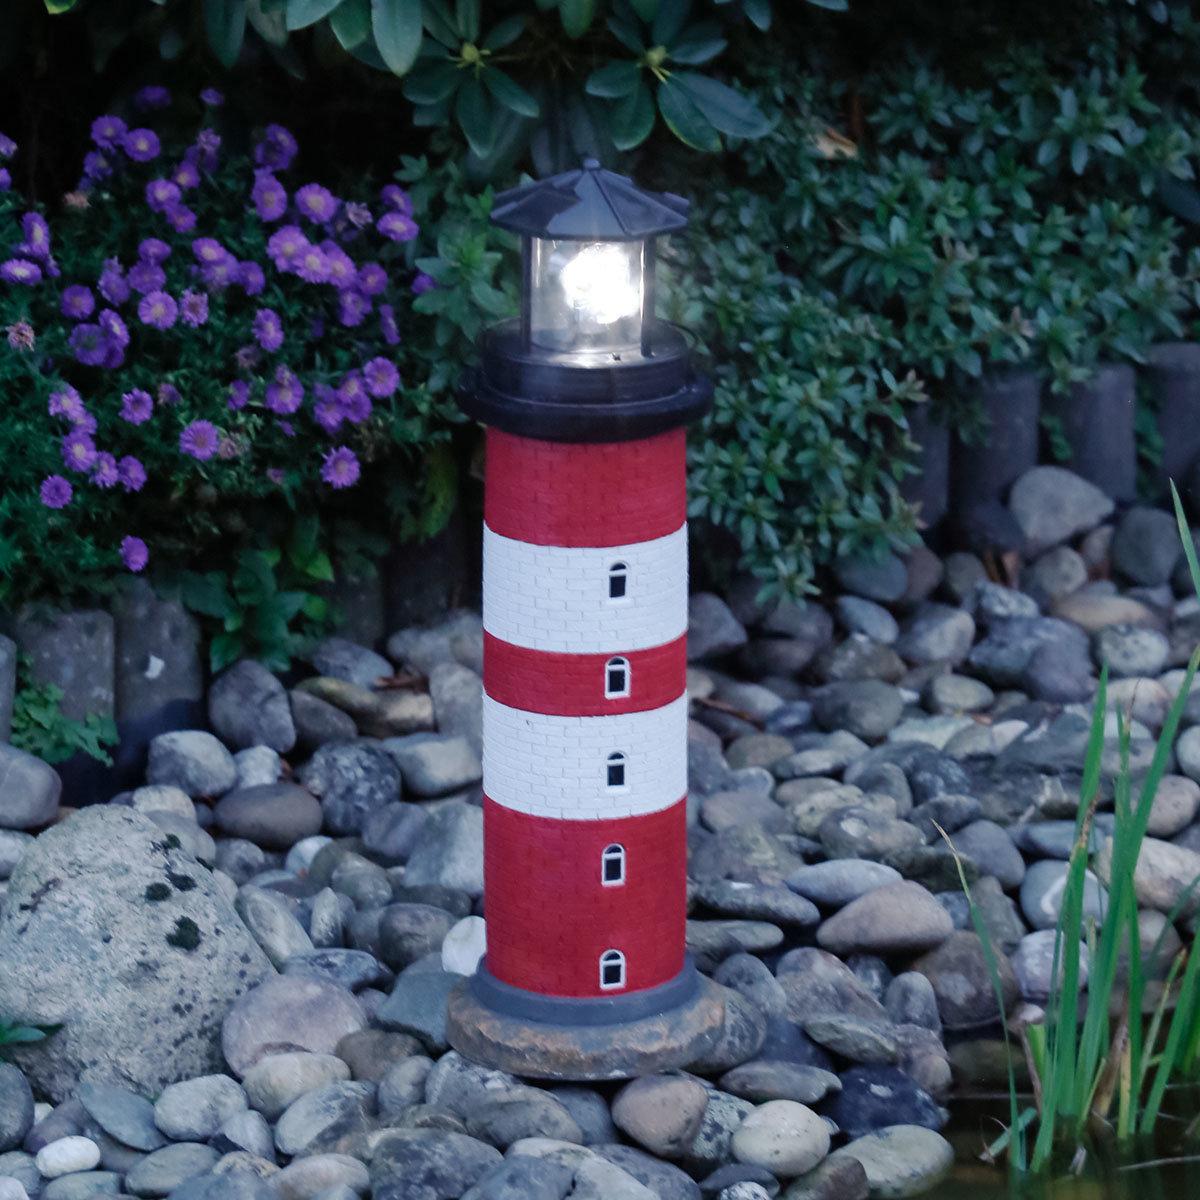 solar leuchtturm amrum online kaufen bei g rtner p tschke. Black Bedroom Furniture Sets. Home Design Ideas